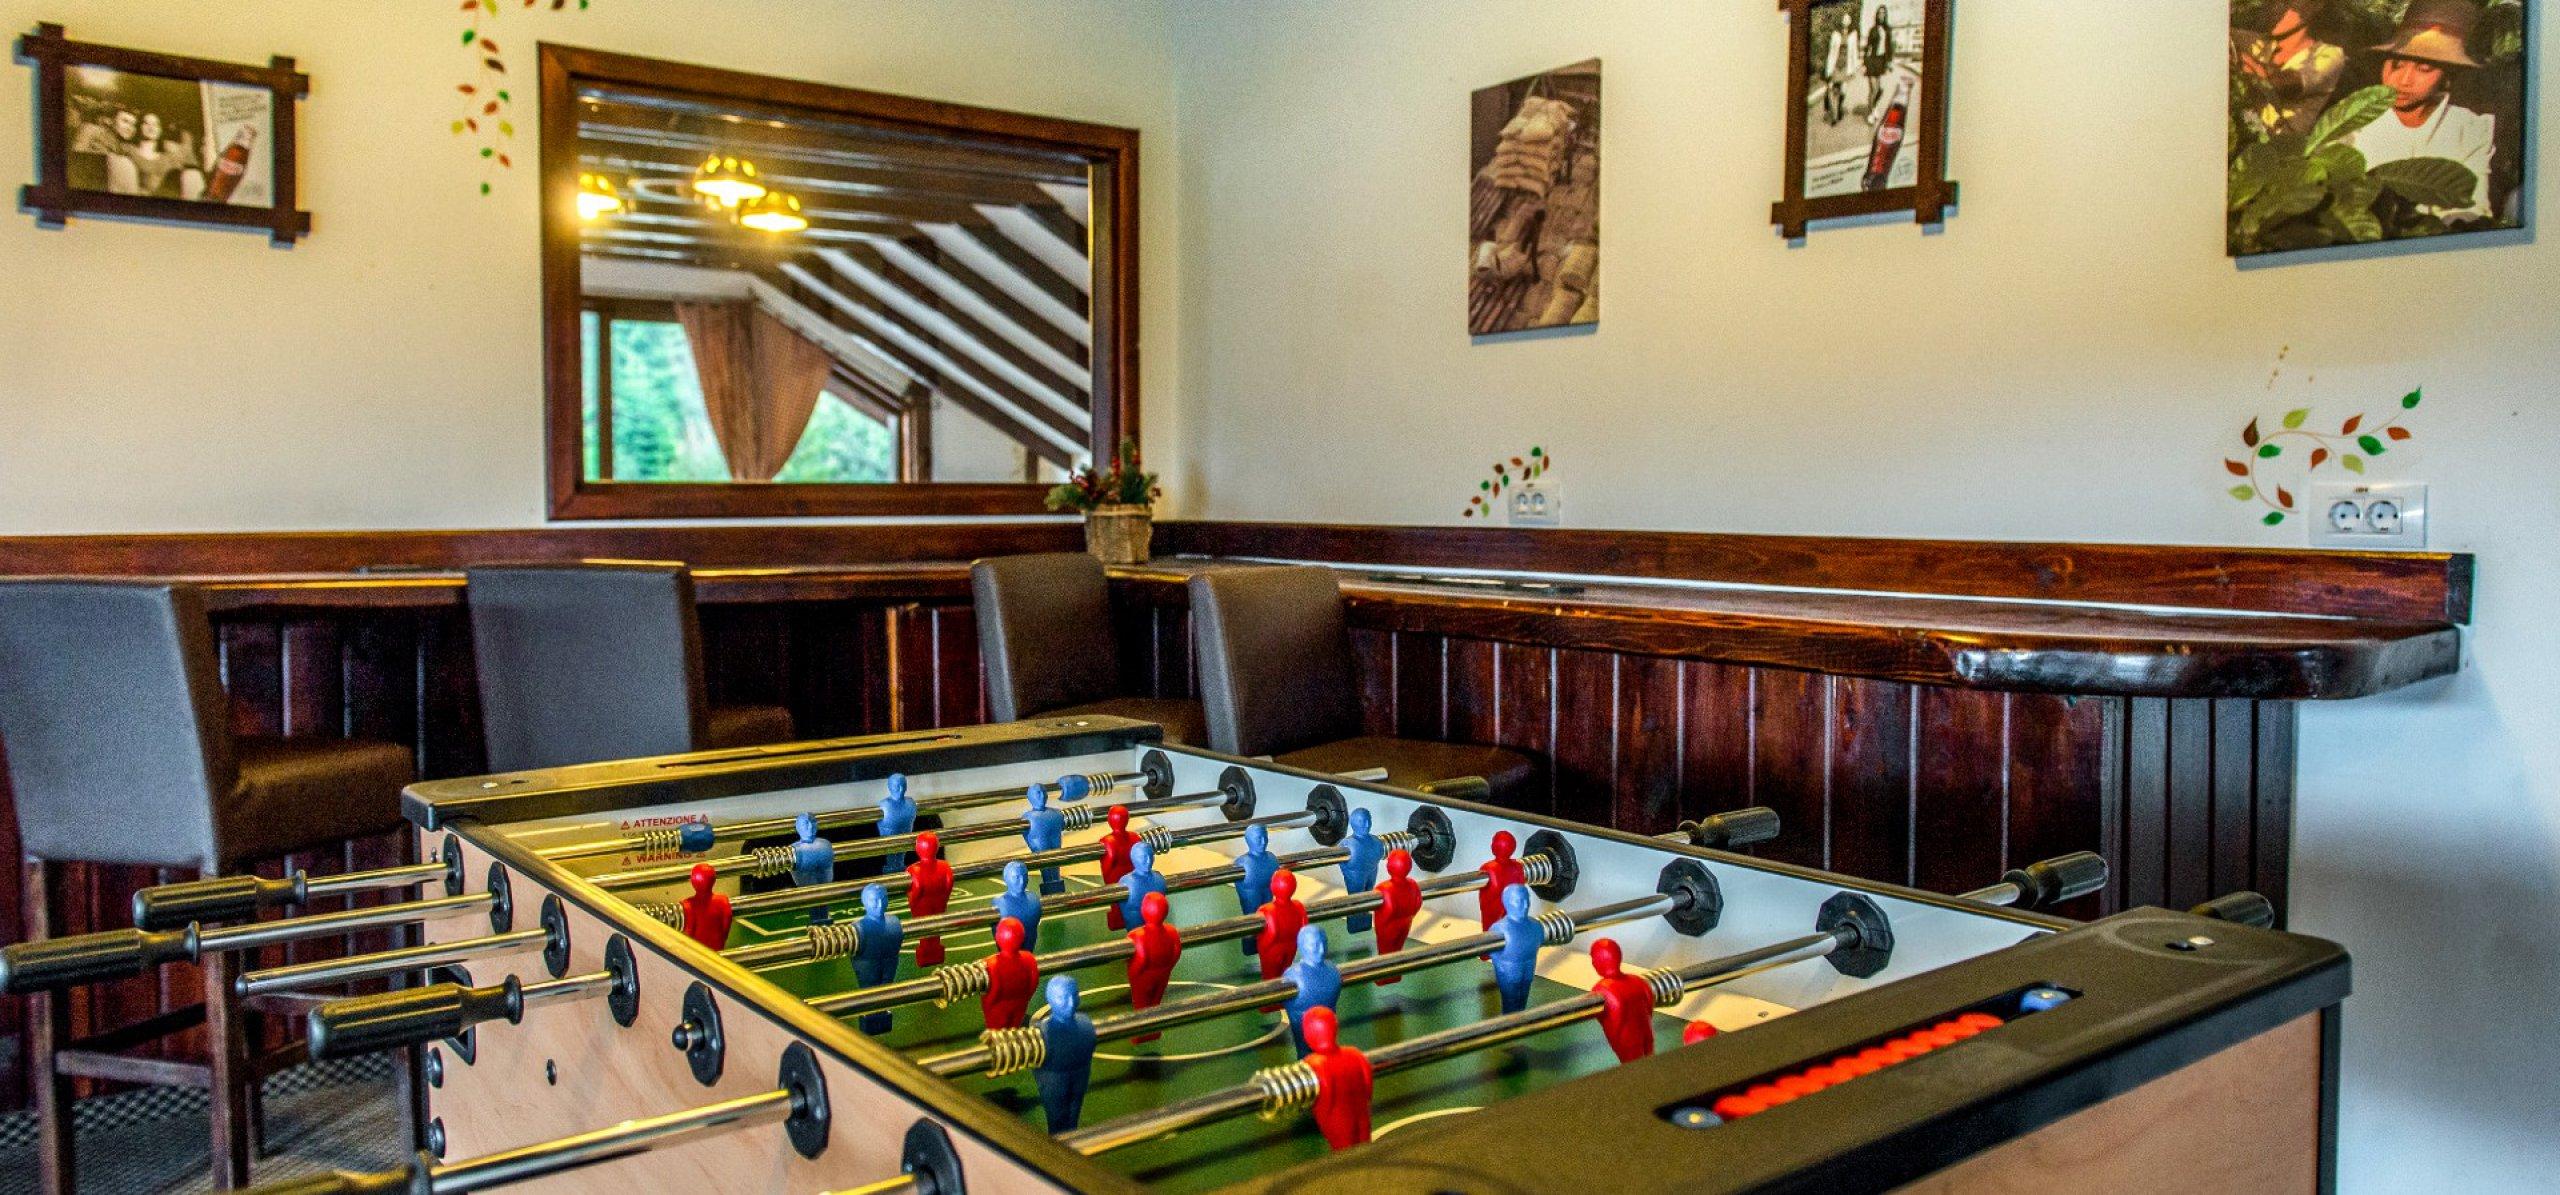 divertisment-pub-fundata-resort-fundata-1